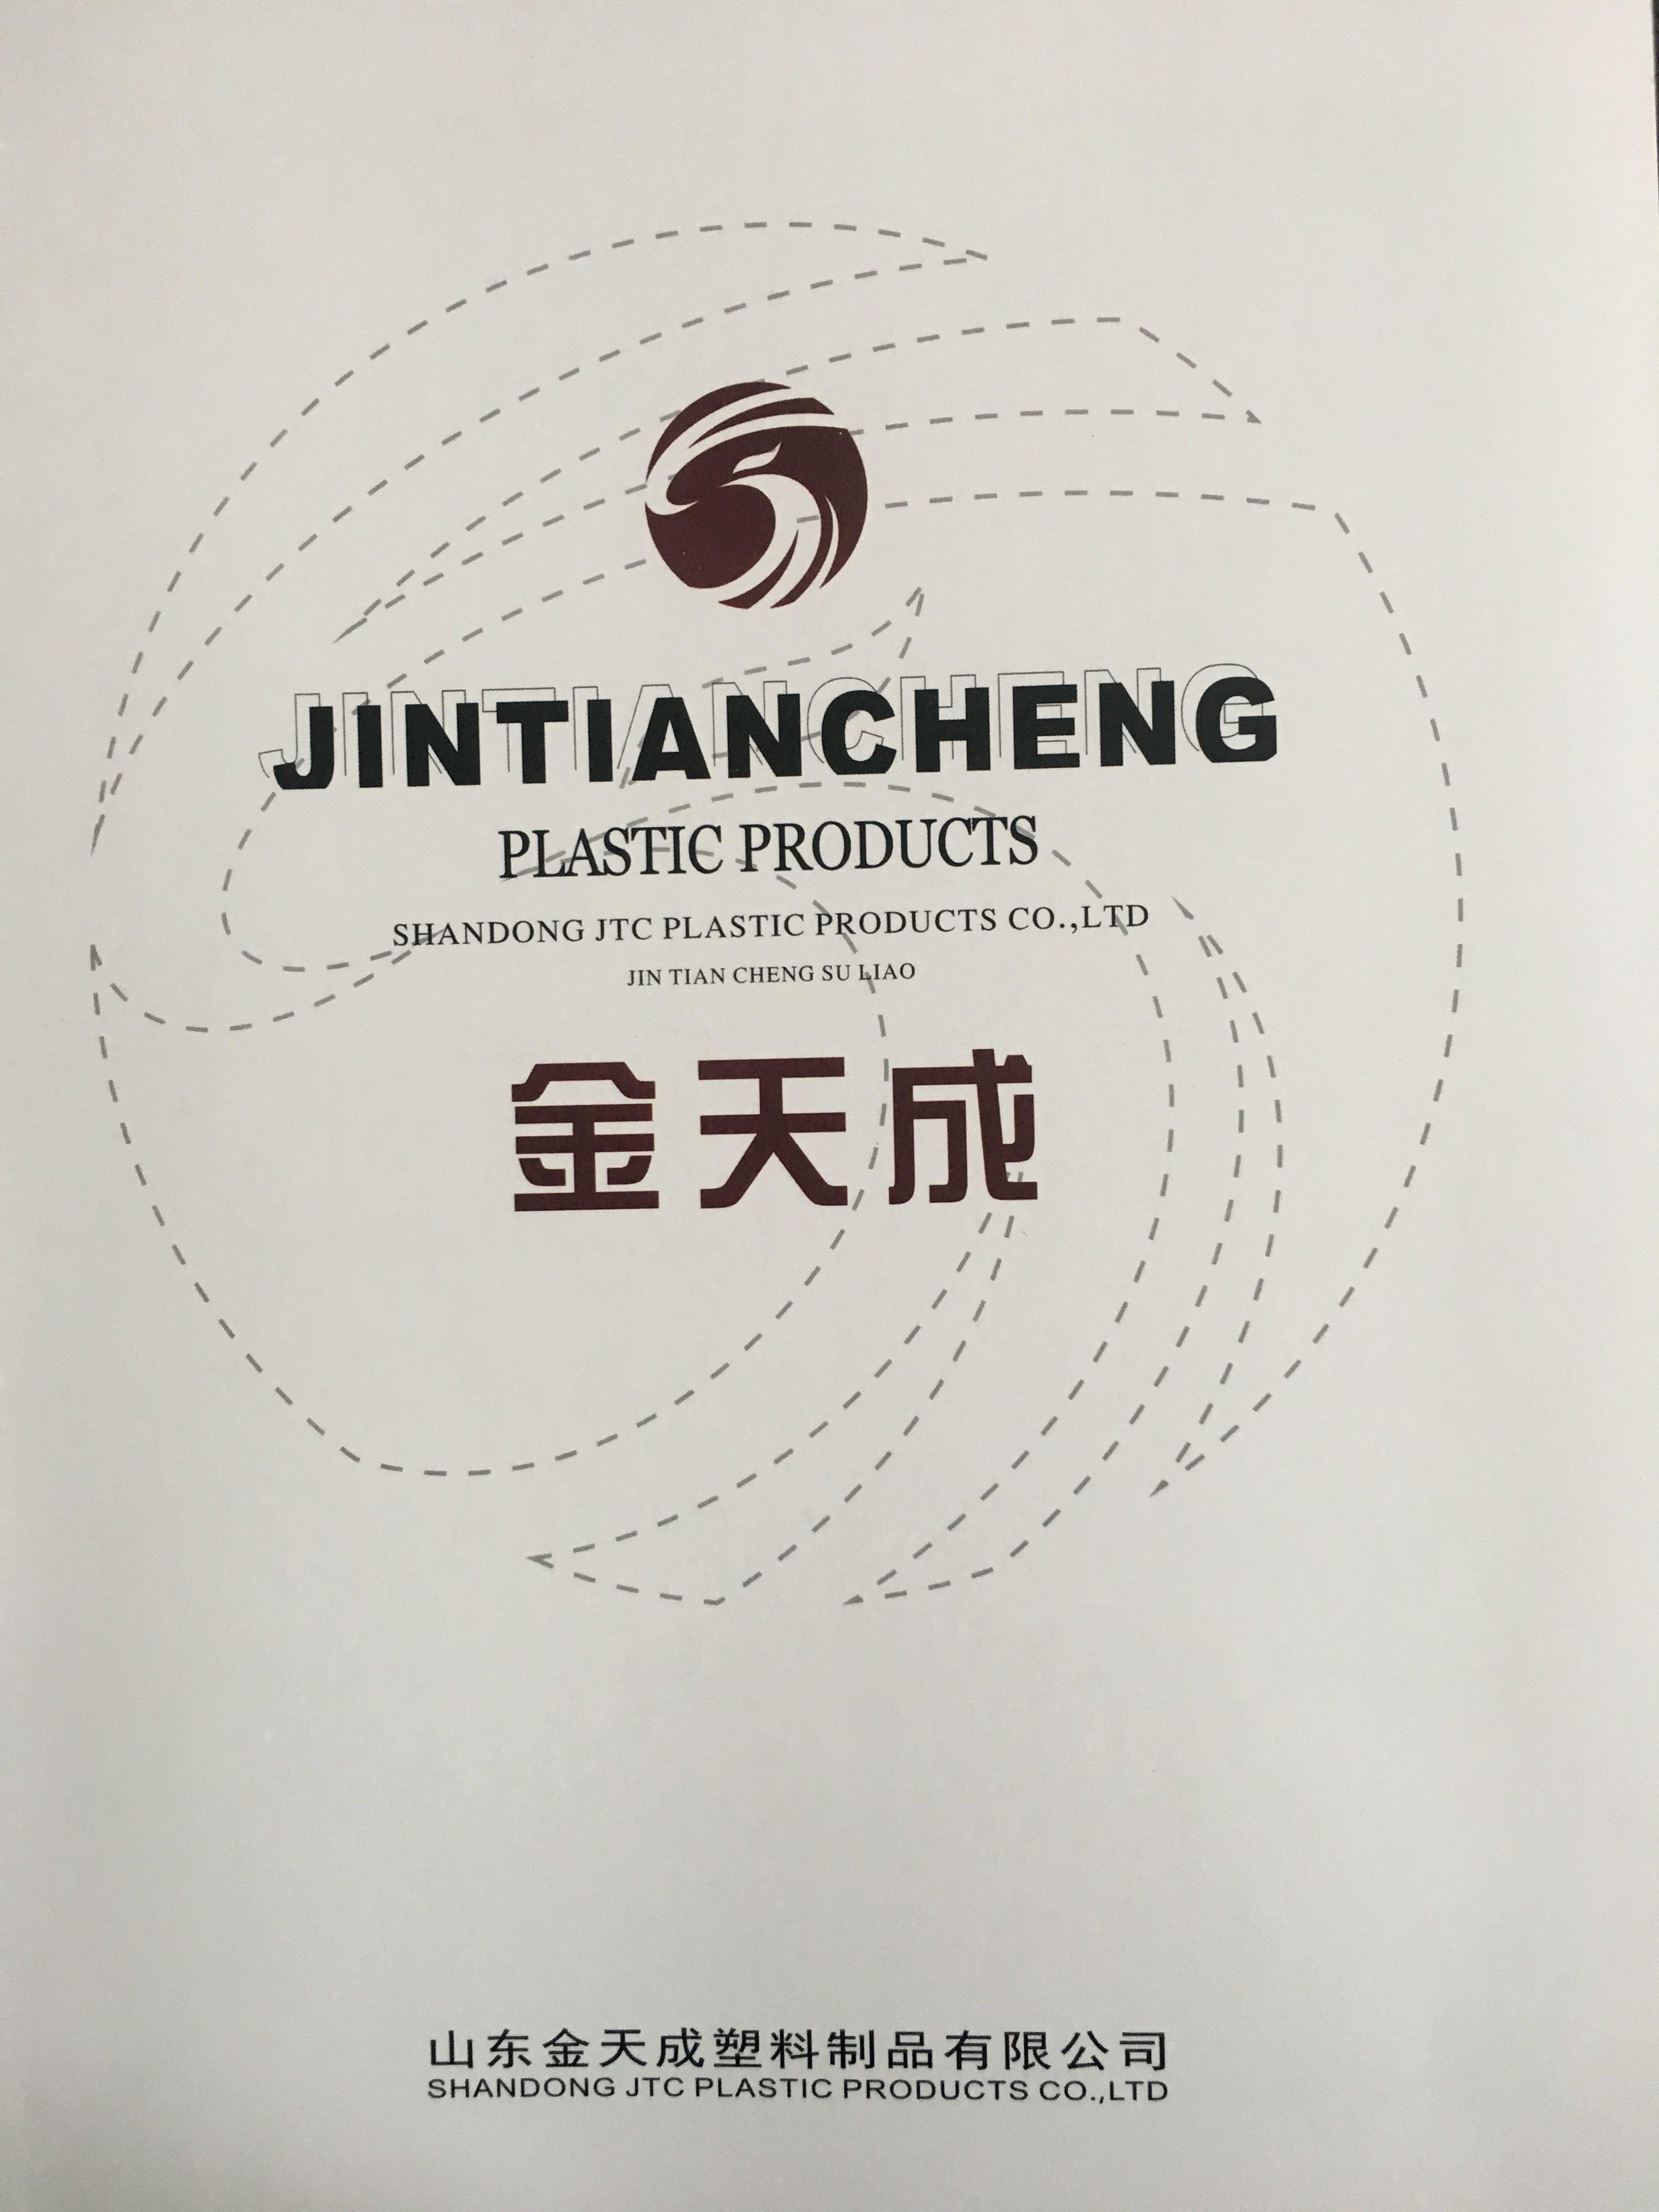 Catalogue of Shandong JTC Plastic